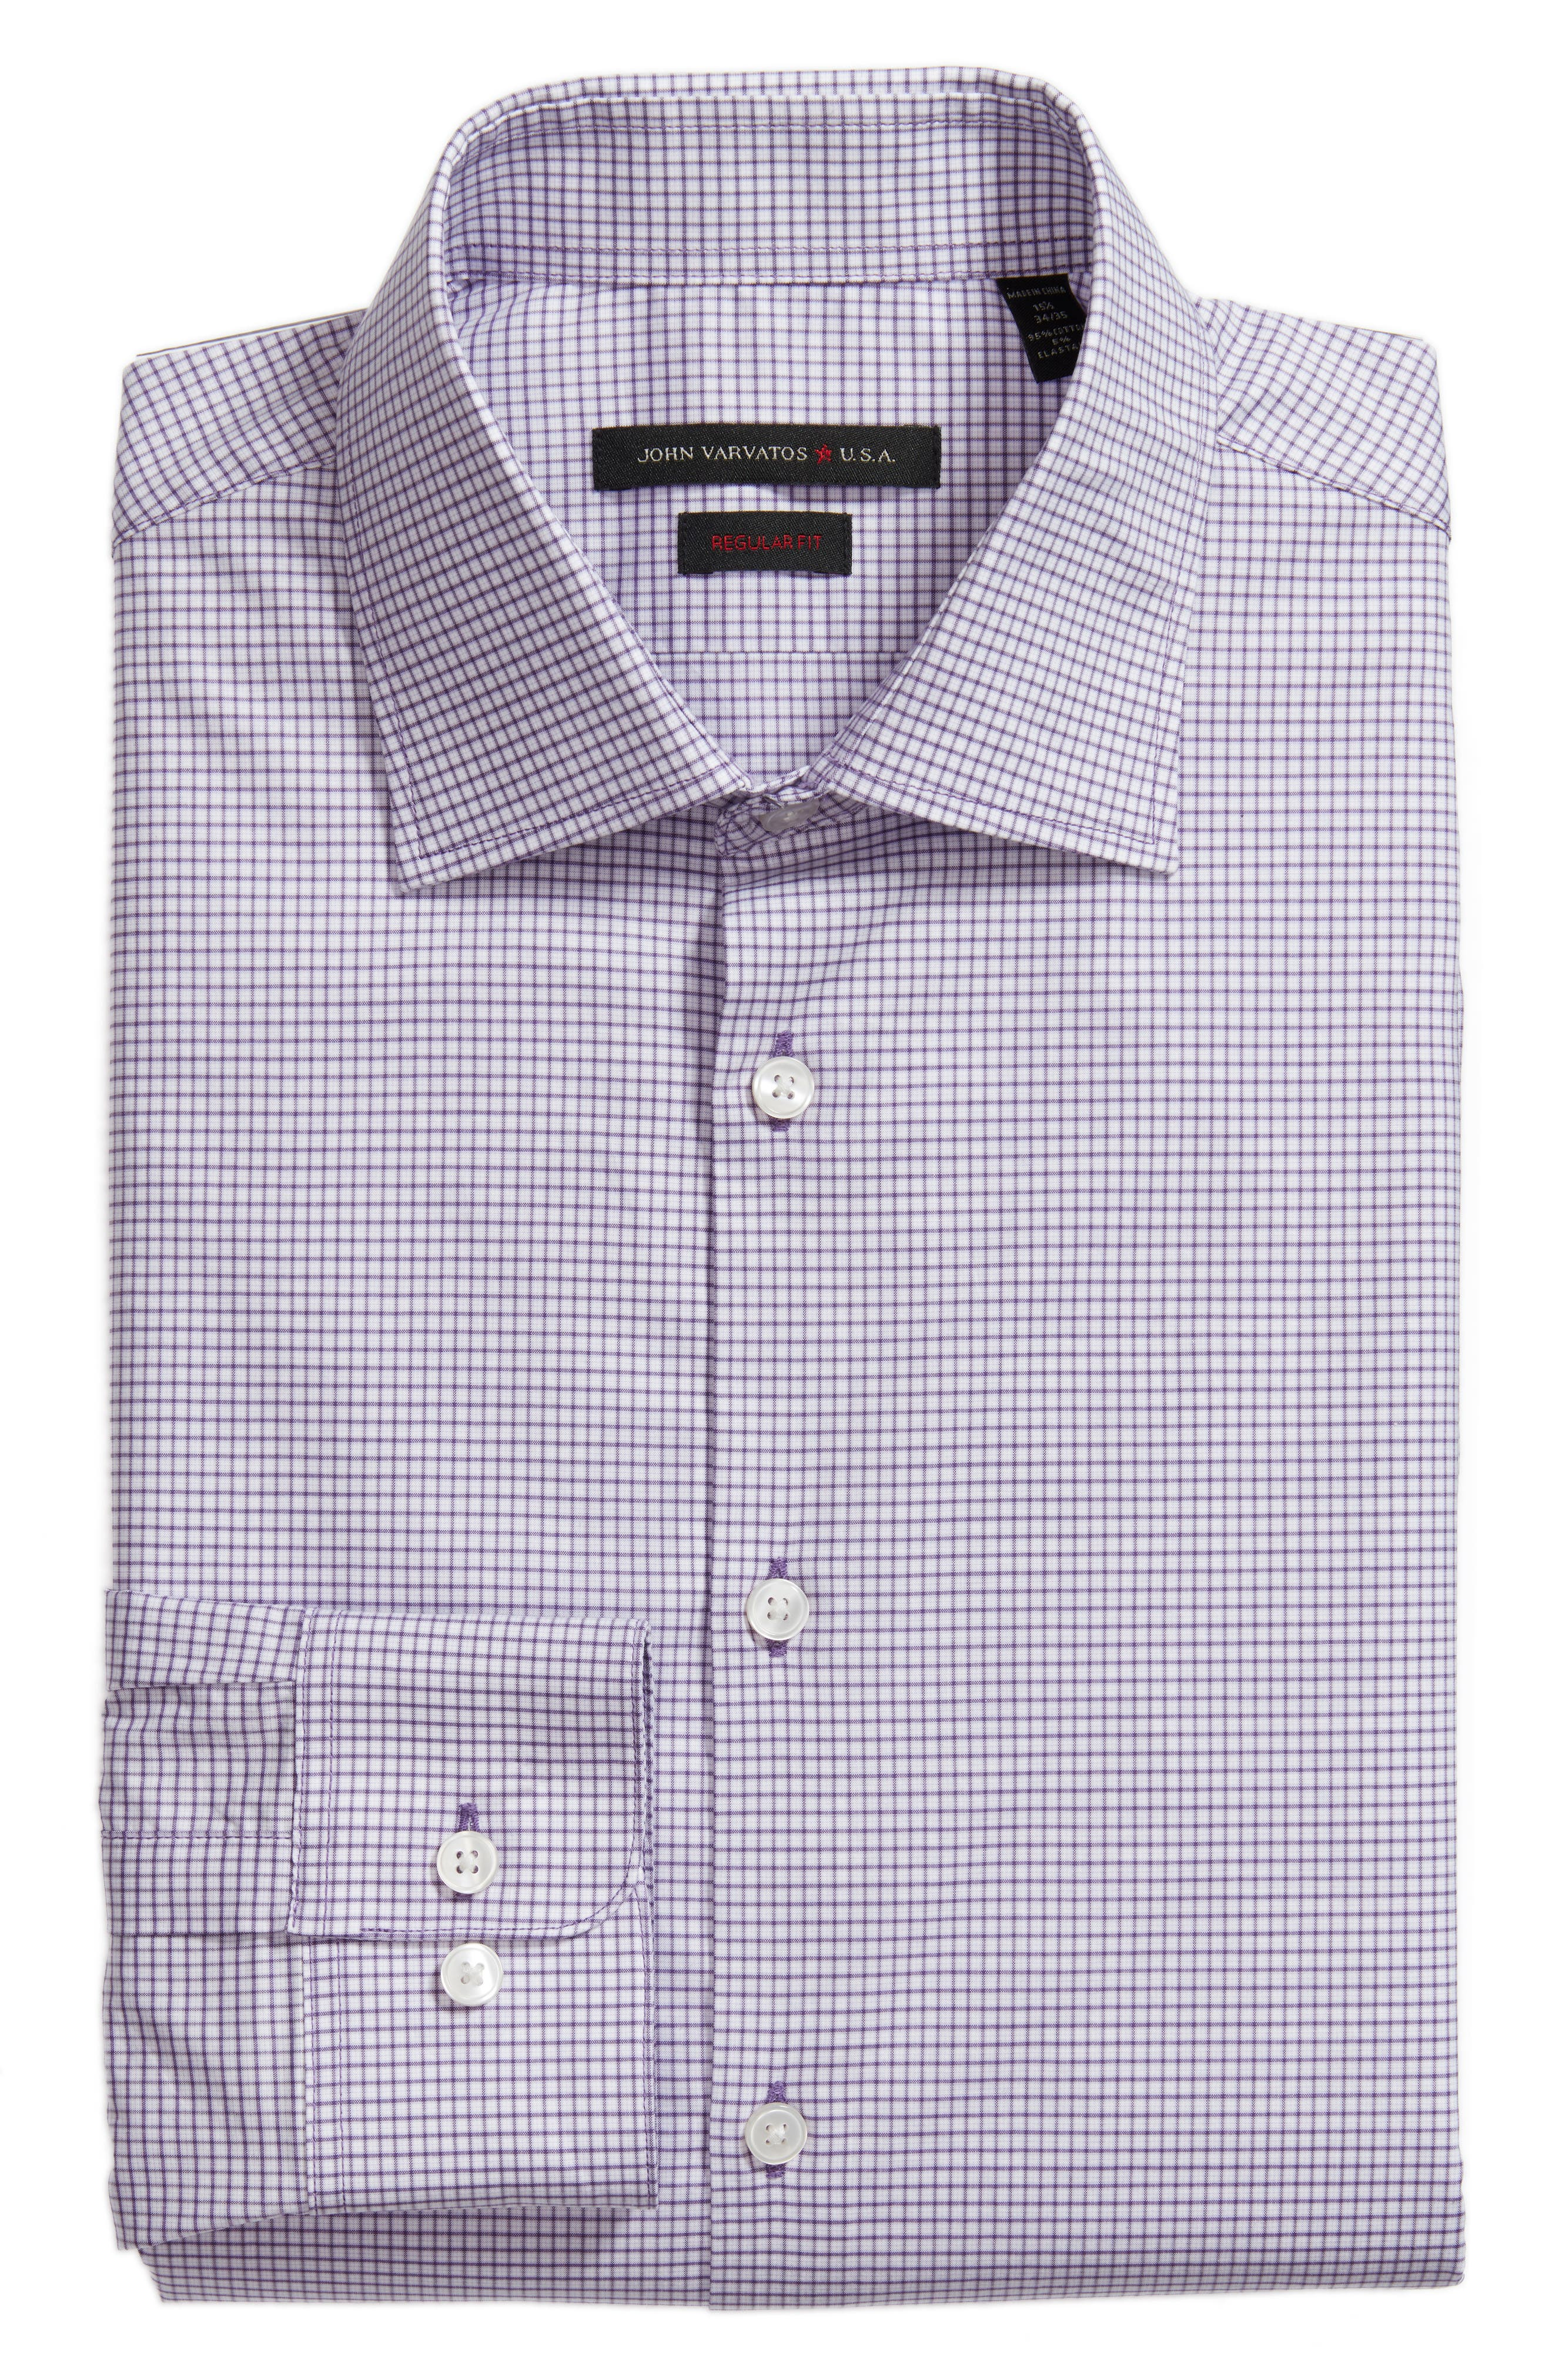 Regular Fit Stretch Check Dress Shirt,                             Alternate thumbnail 6, color,                             Purple